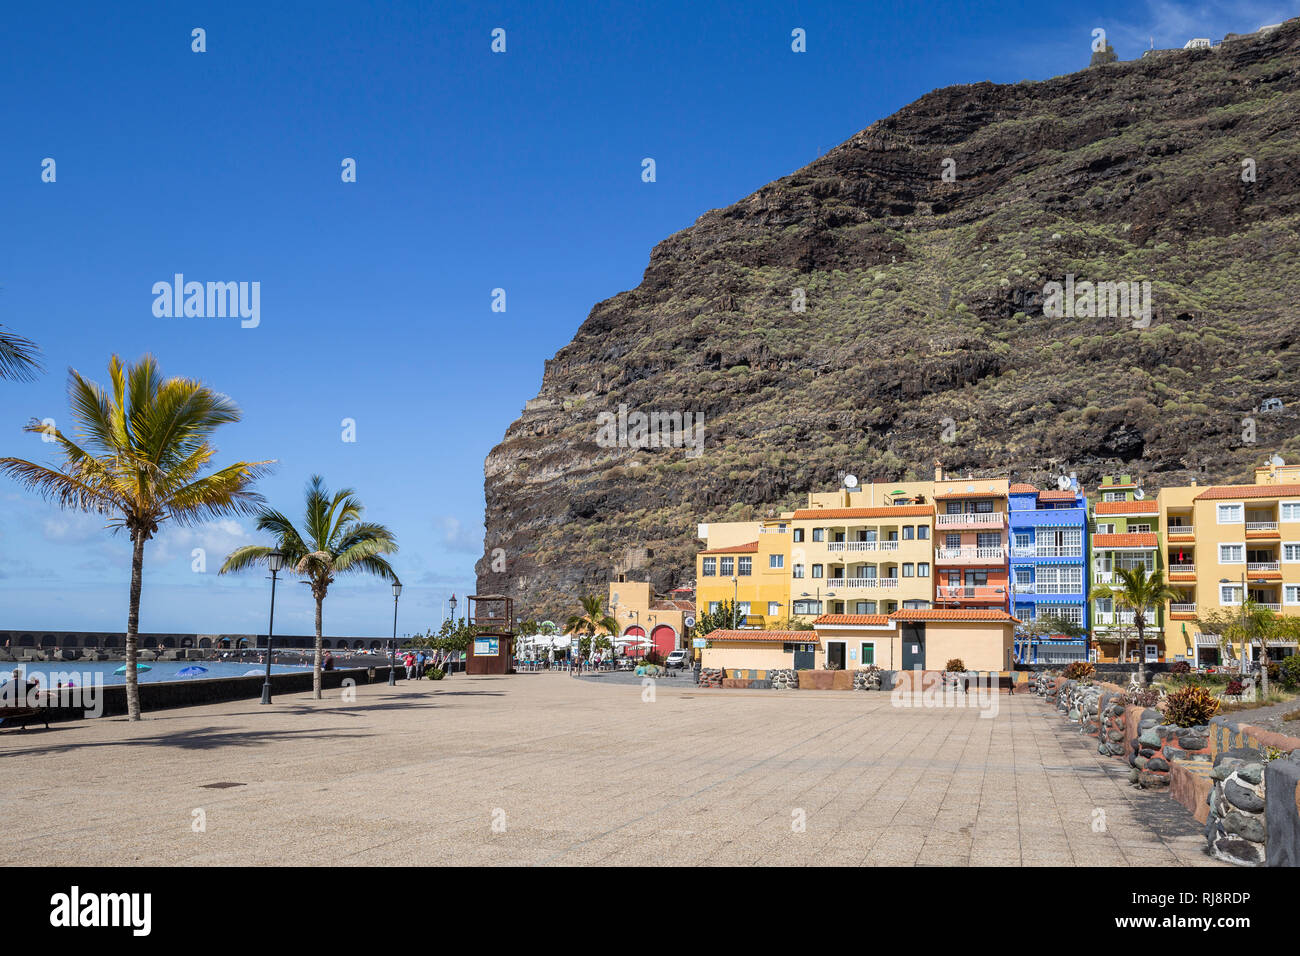 Promenade, Puerto de Tazacorte, La Palma, Kanarische Inseln, Spanien Stock Photo